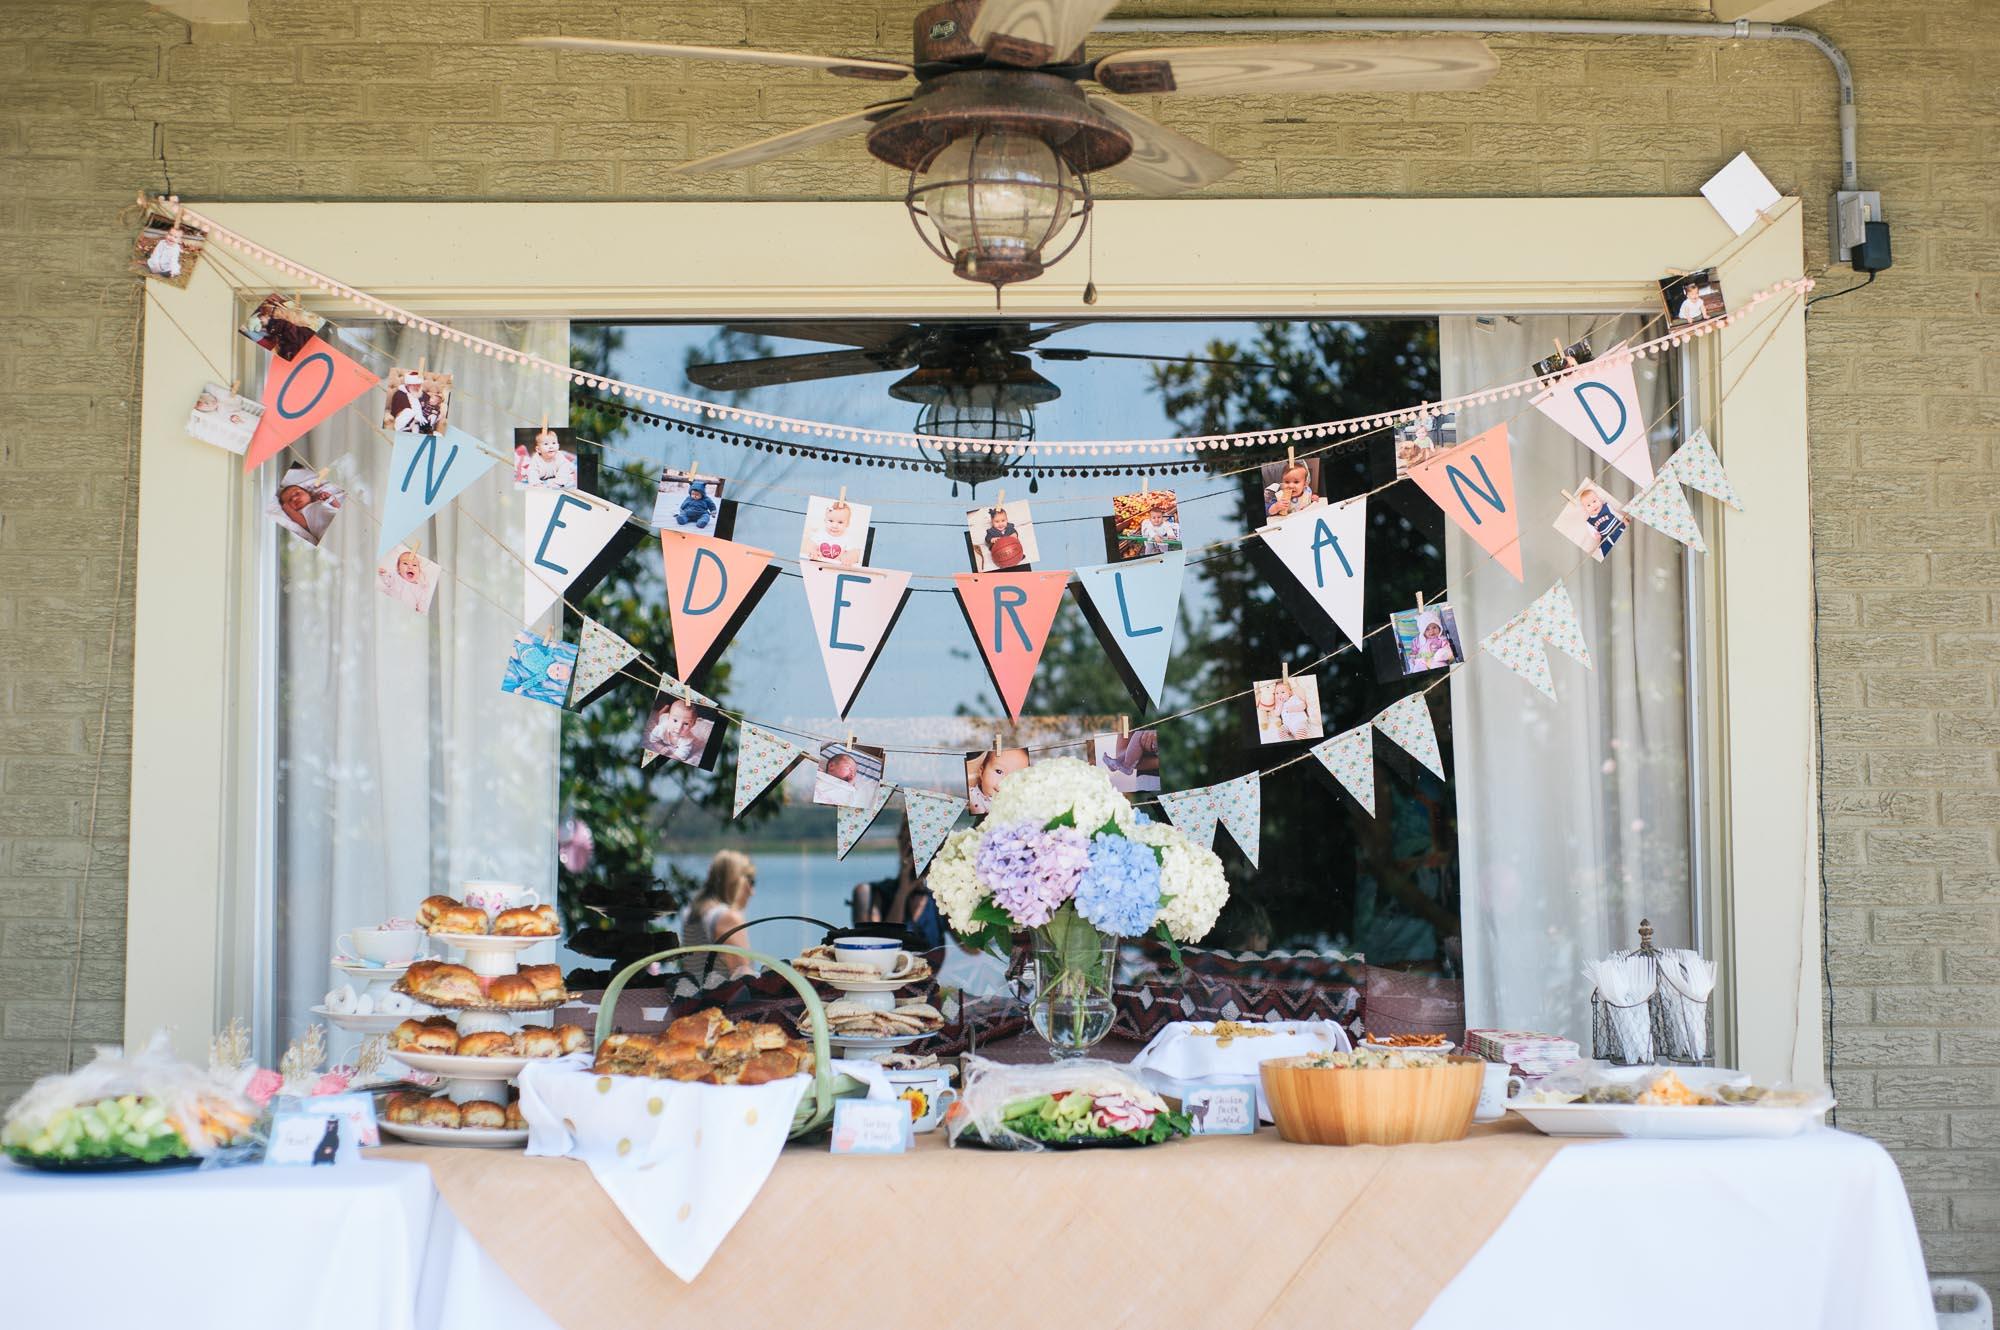 m.newsom-photography-one-year-old-girls-birthday-party-ideas-alice-in-wonderland (13 of 42).jpg